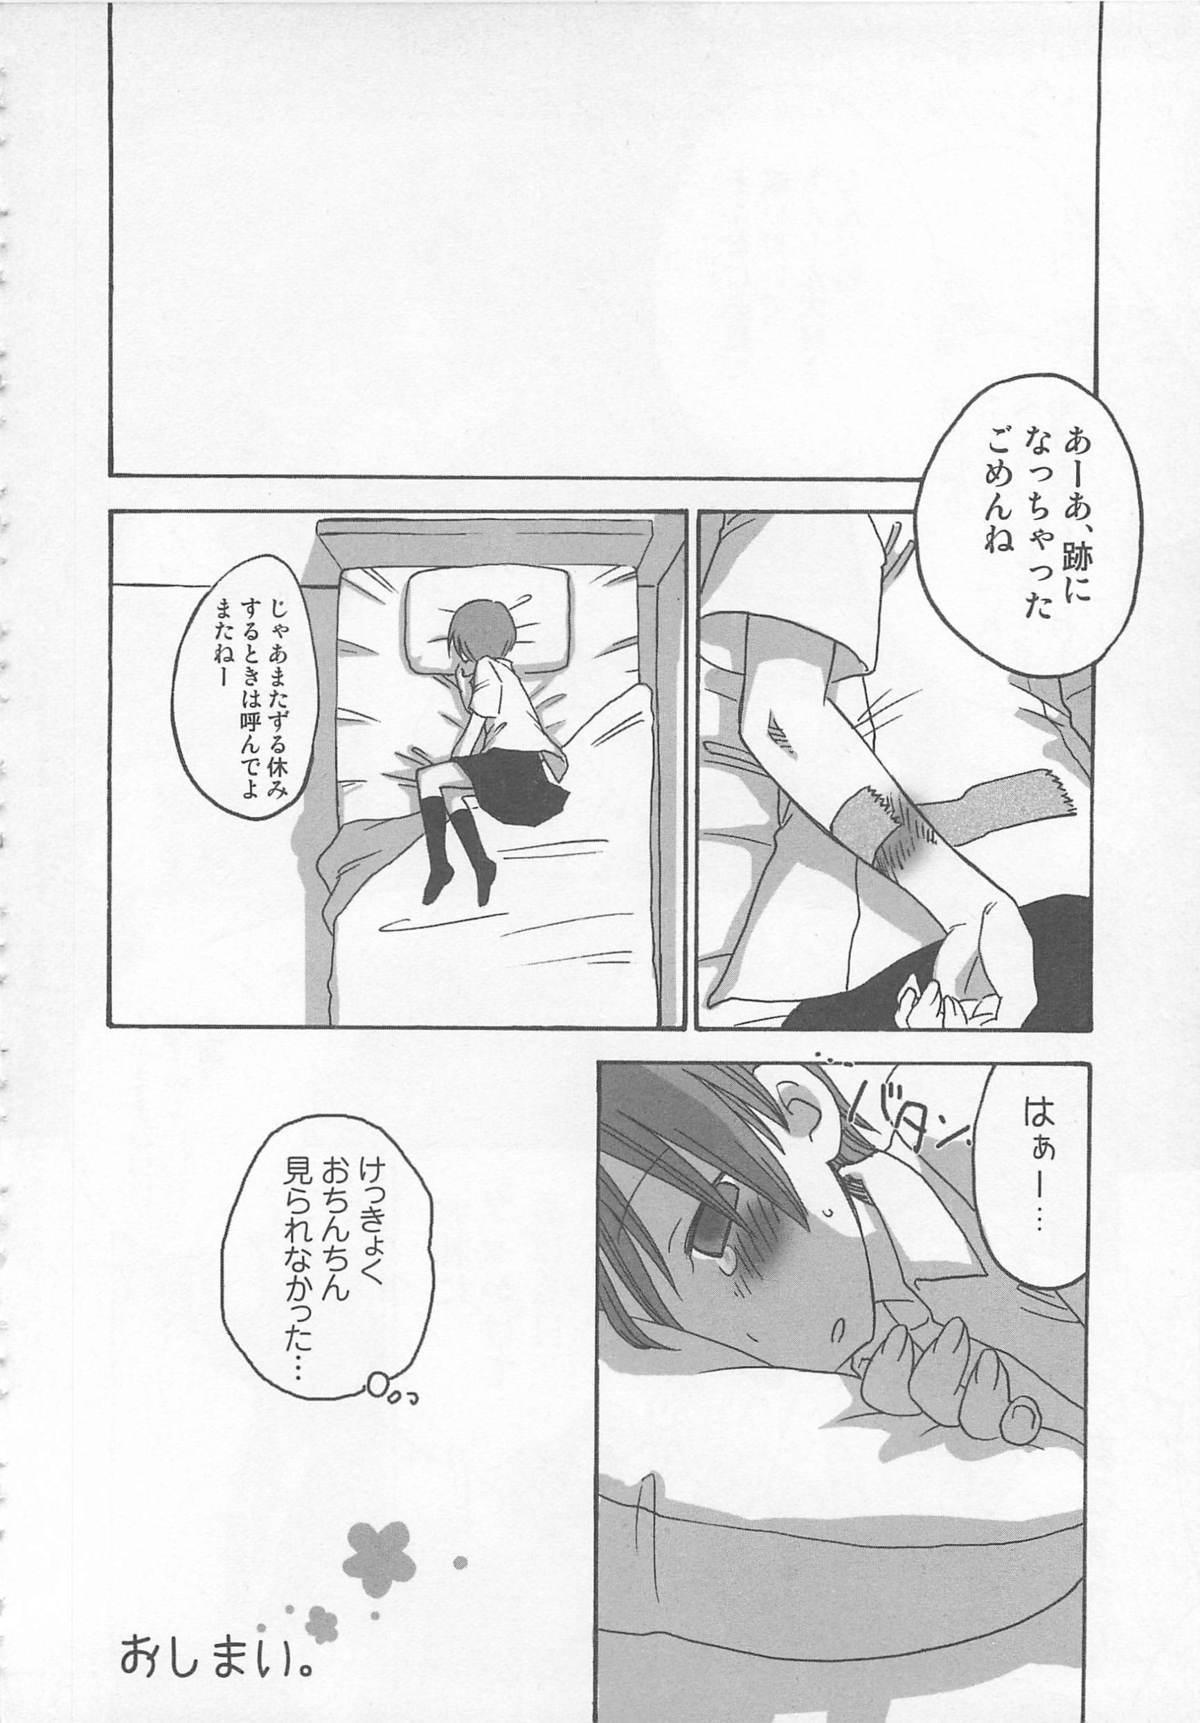 Otokonoko HEAVEN Vol. 02 Dokidoki Chikan Taiken 36